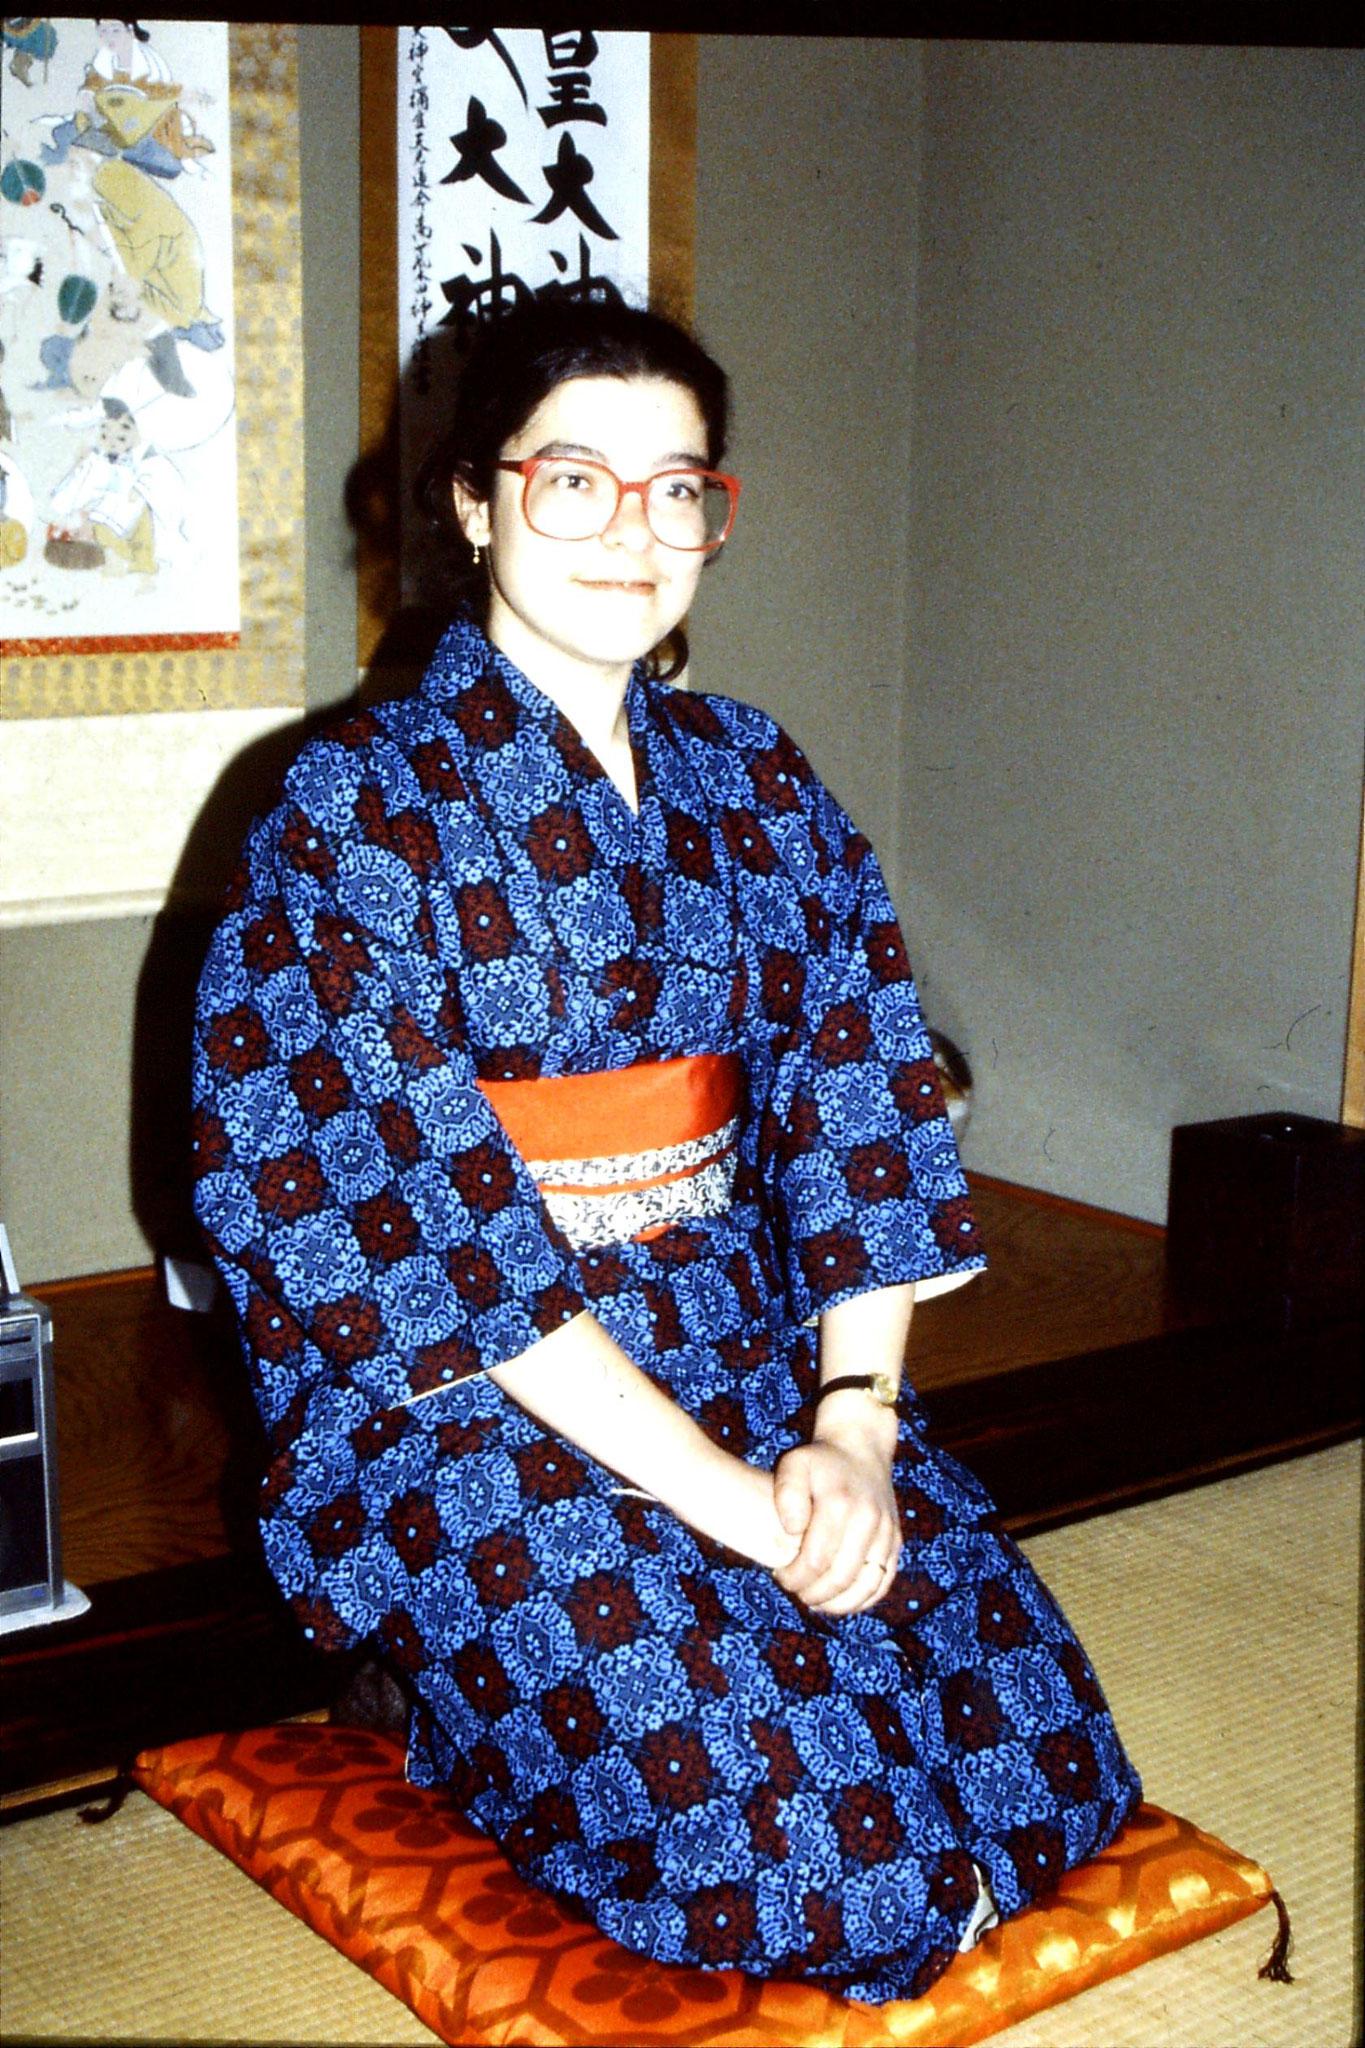 26/1/1989: 9: Kyoto